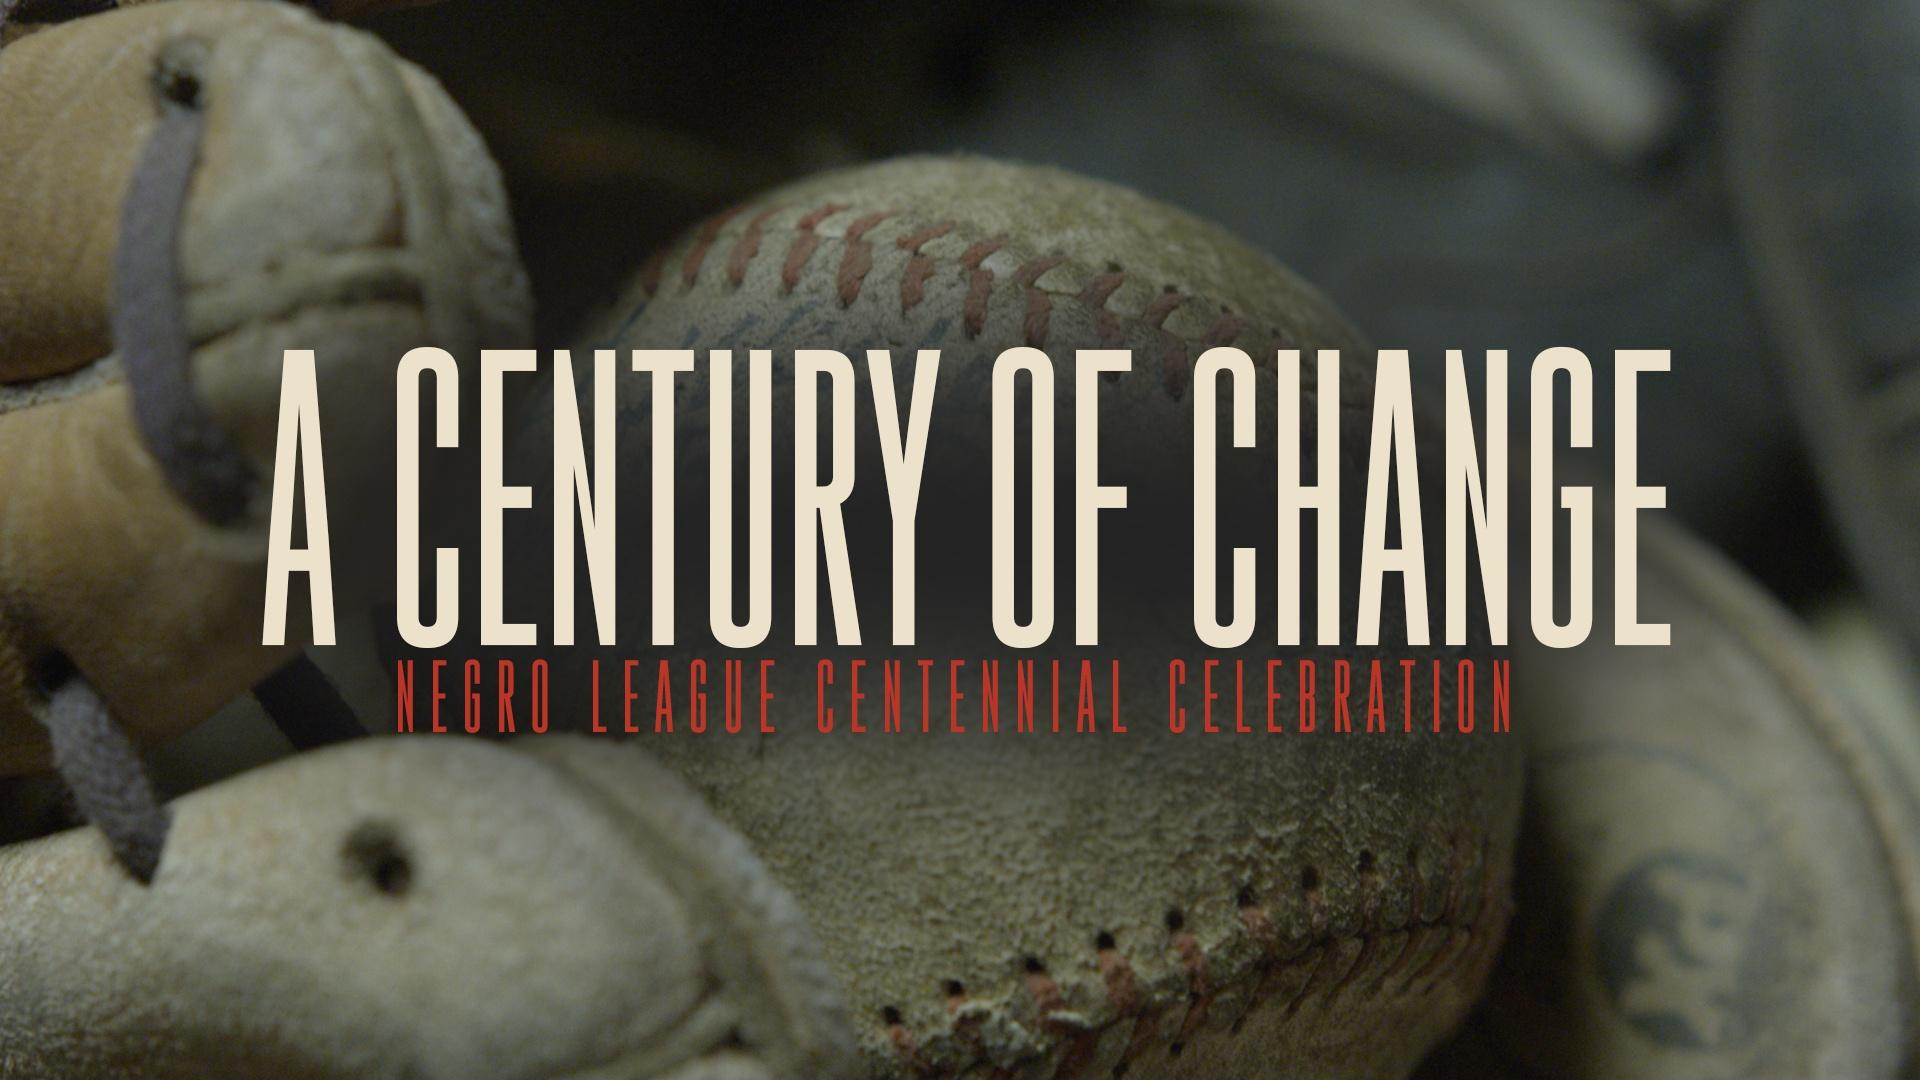 Negro League Centennial Celebration